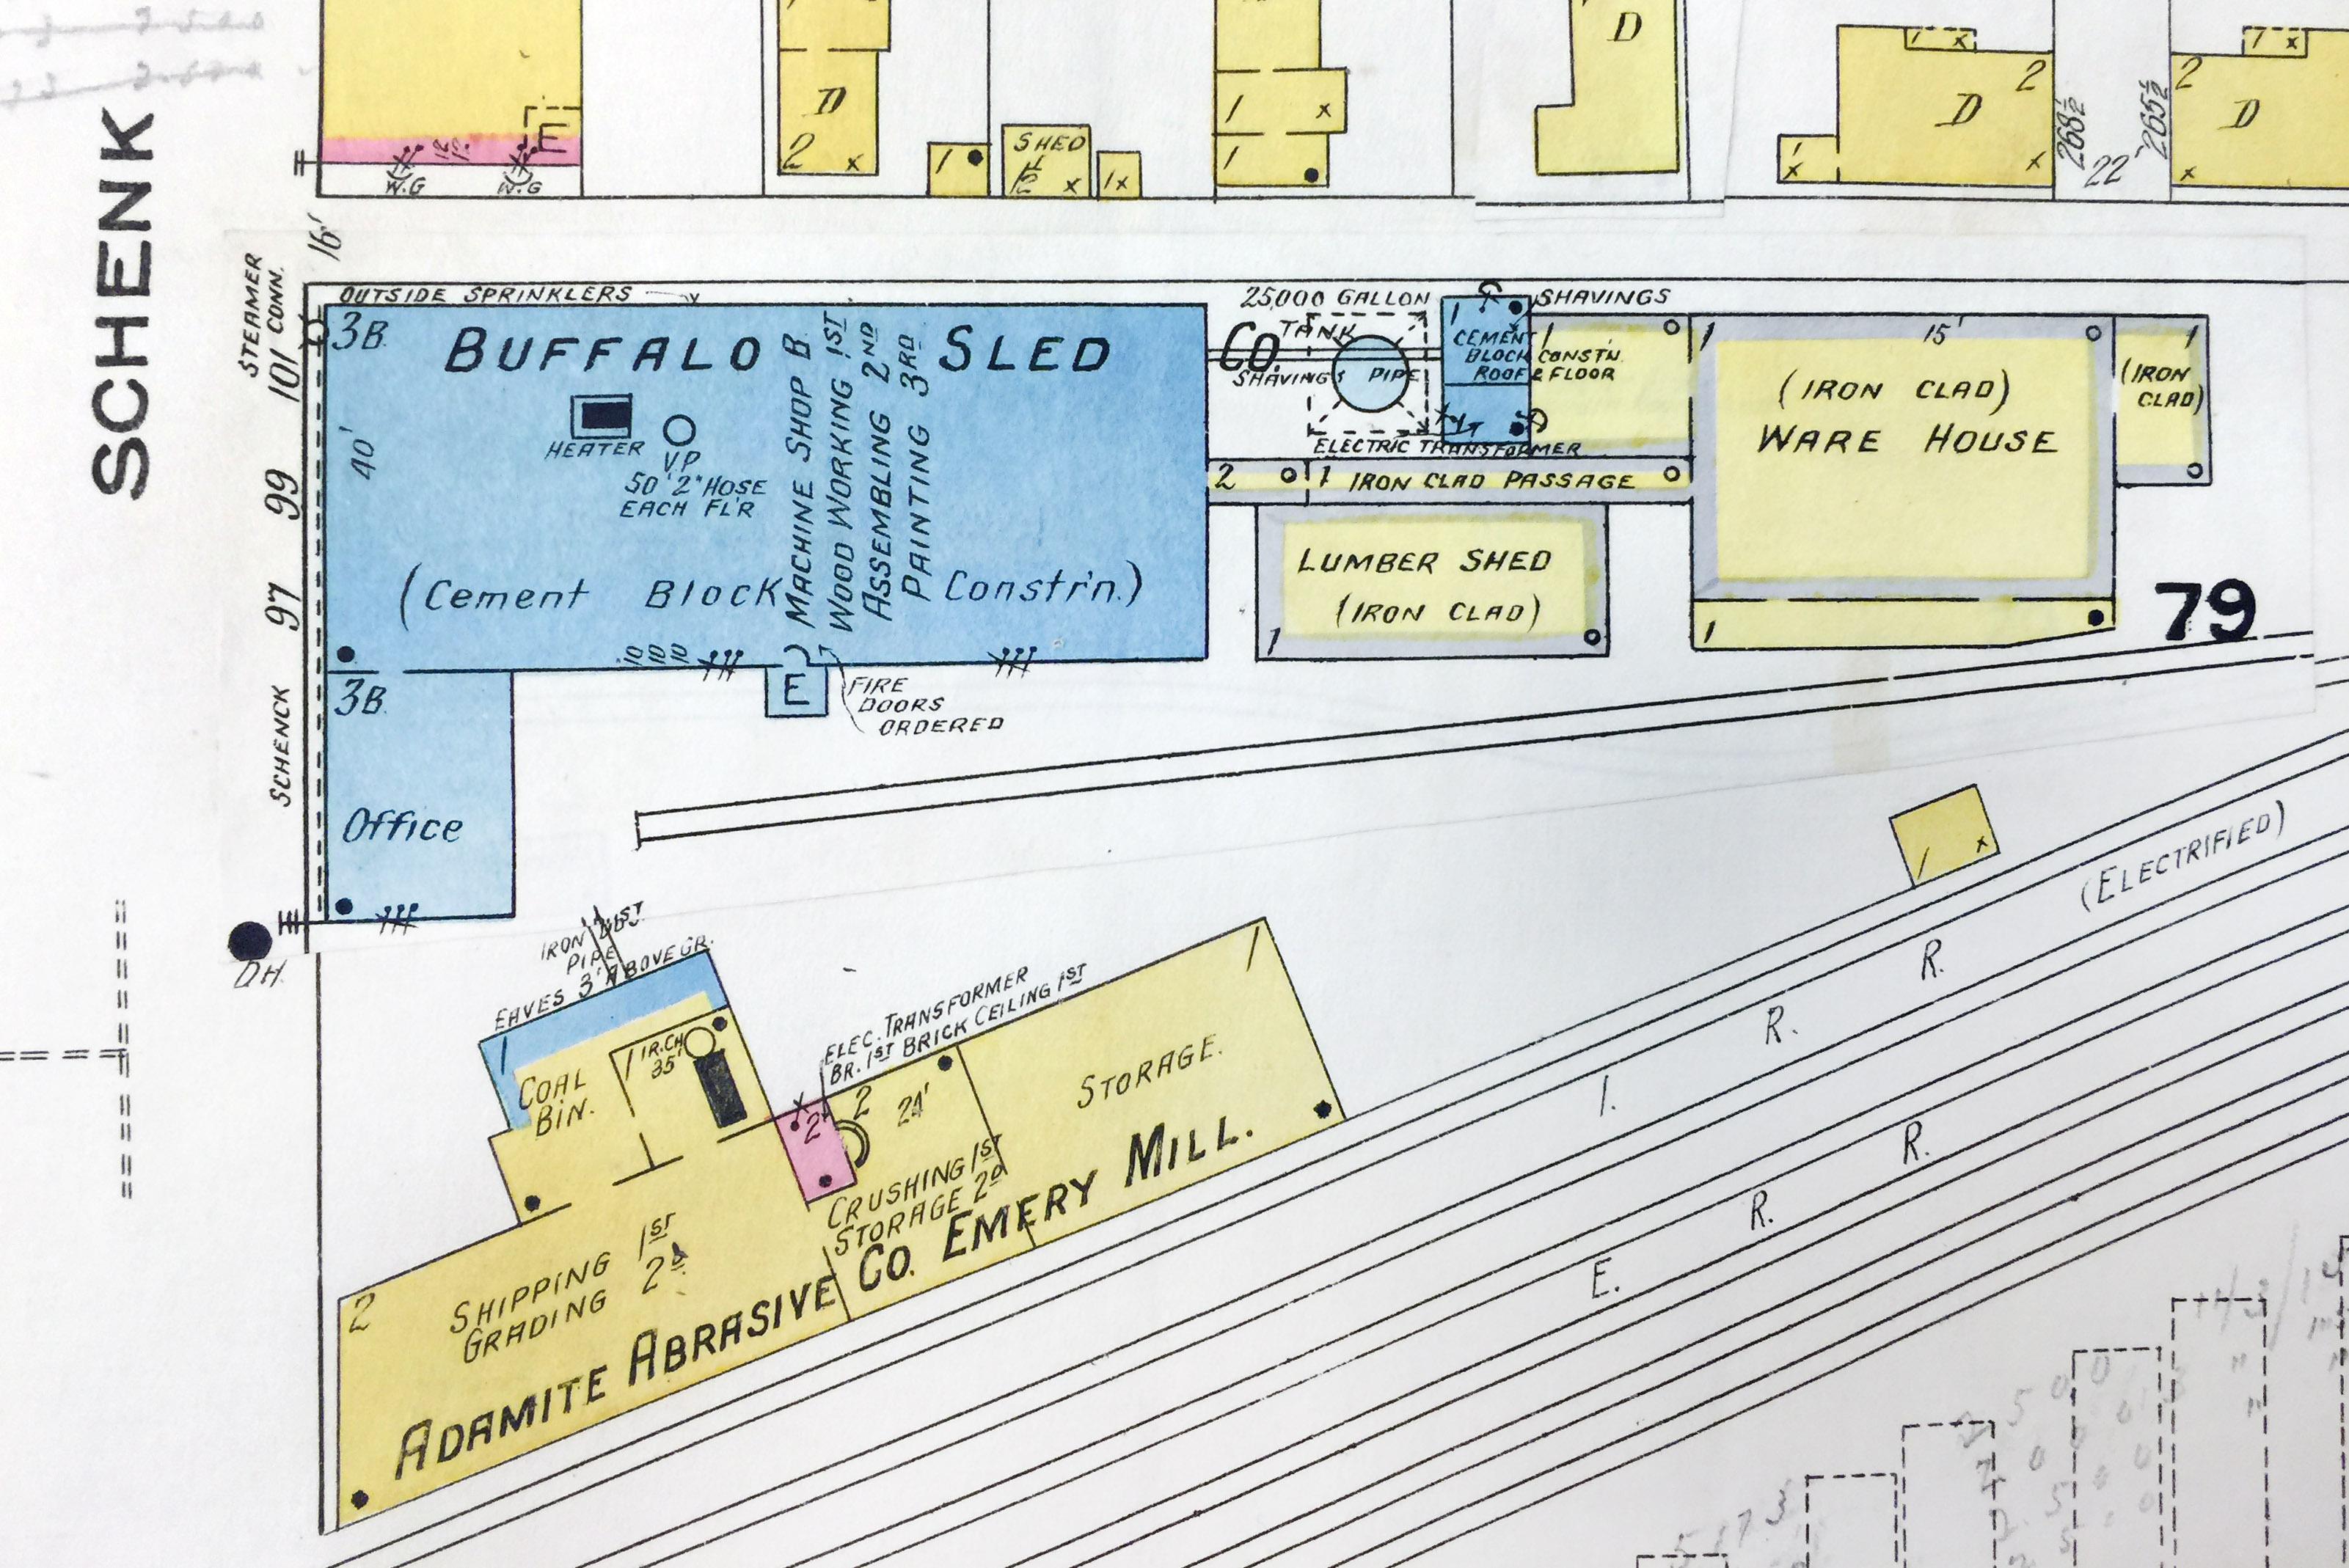 Buffalo Sled and Adamite Abrasives Emery Mill, map detail (Sanborn Map Company, 1910, 1913).jpg